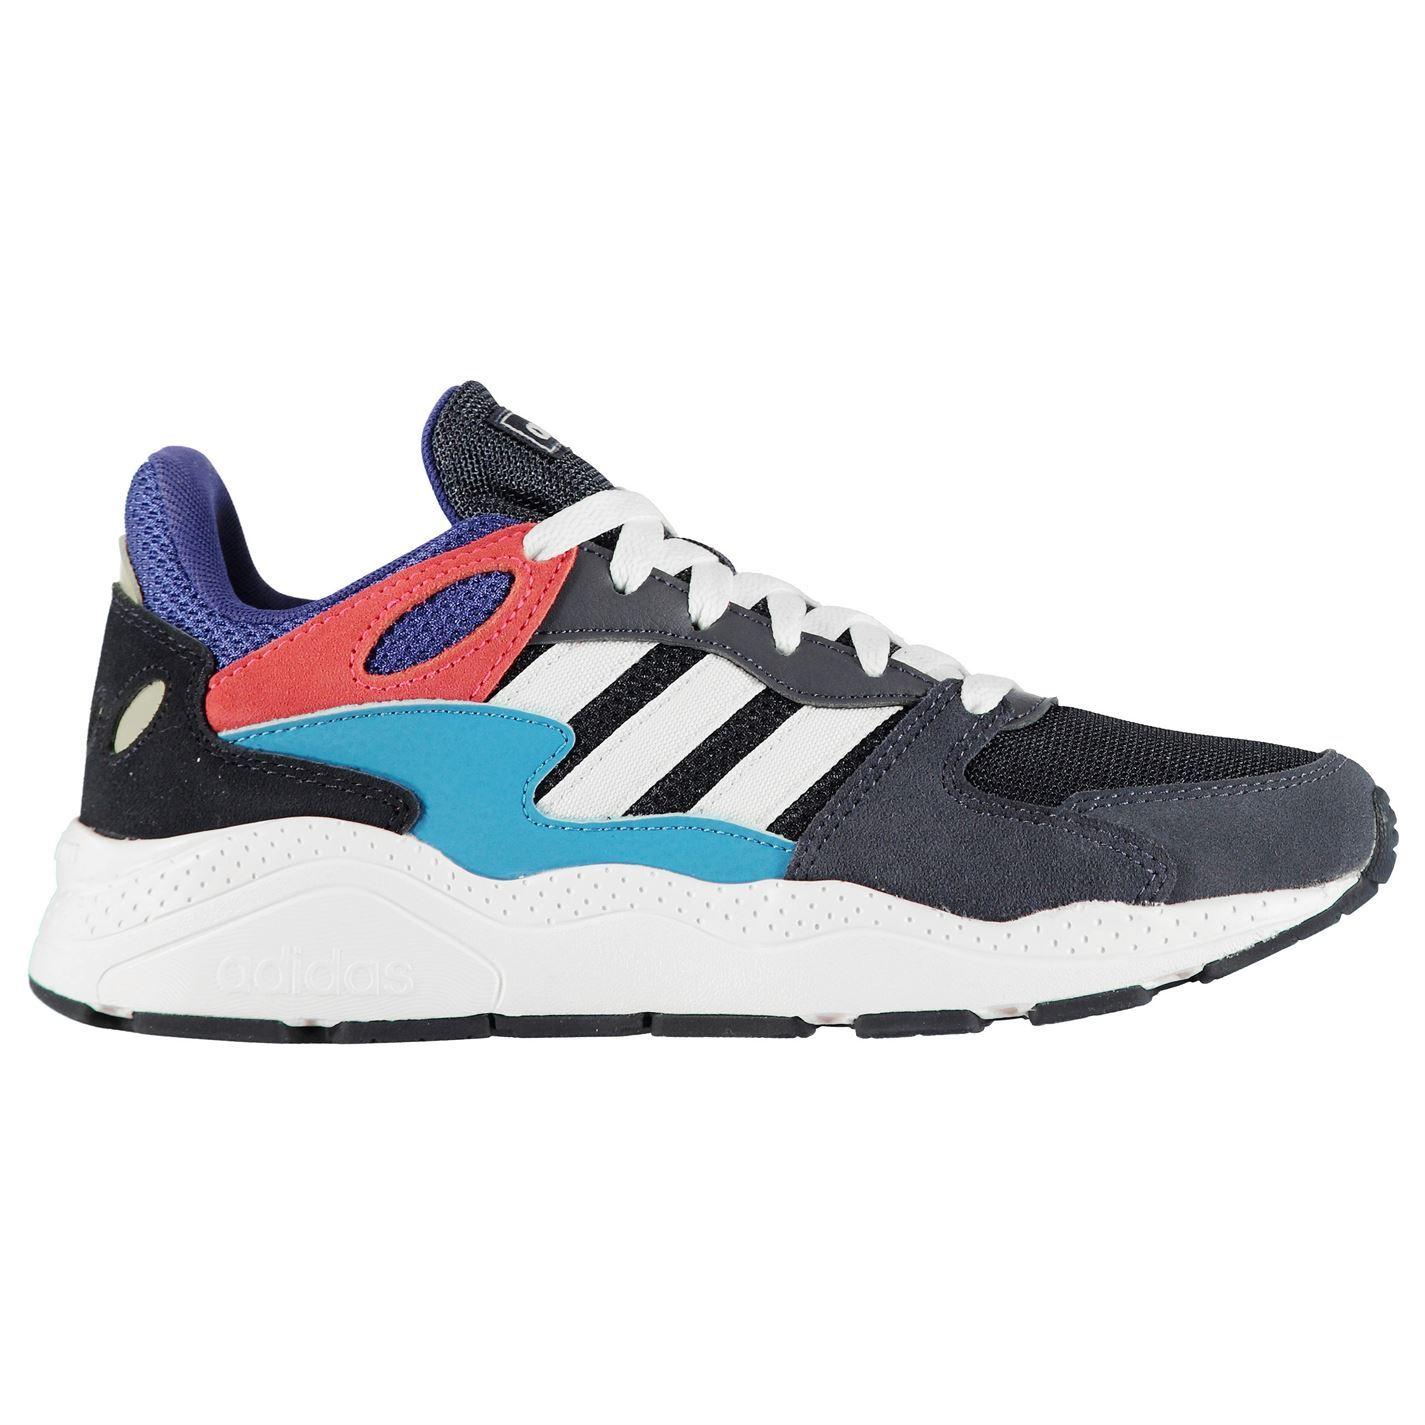 Adidas-Crazychaos-Baskets-Homme-Chaussures-De-Loisirs-Chaussures-Baskets miniature 20